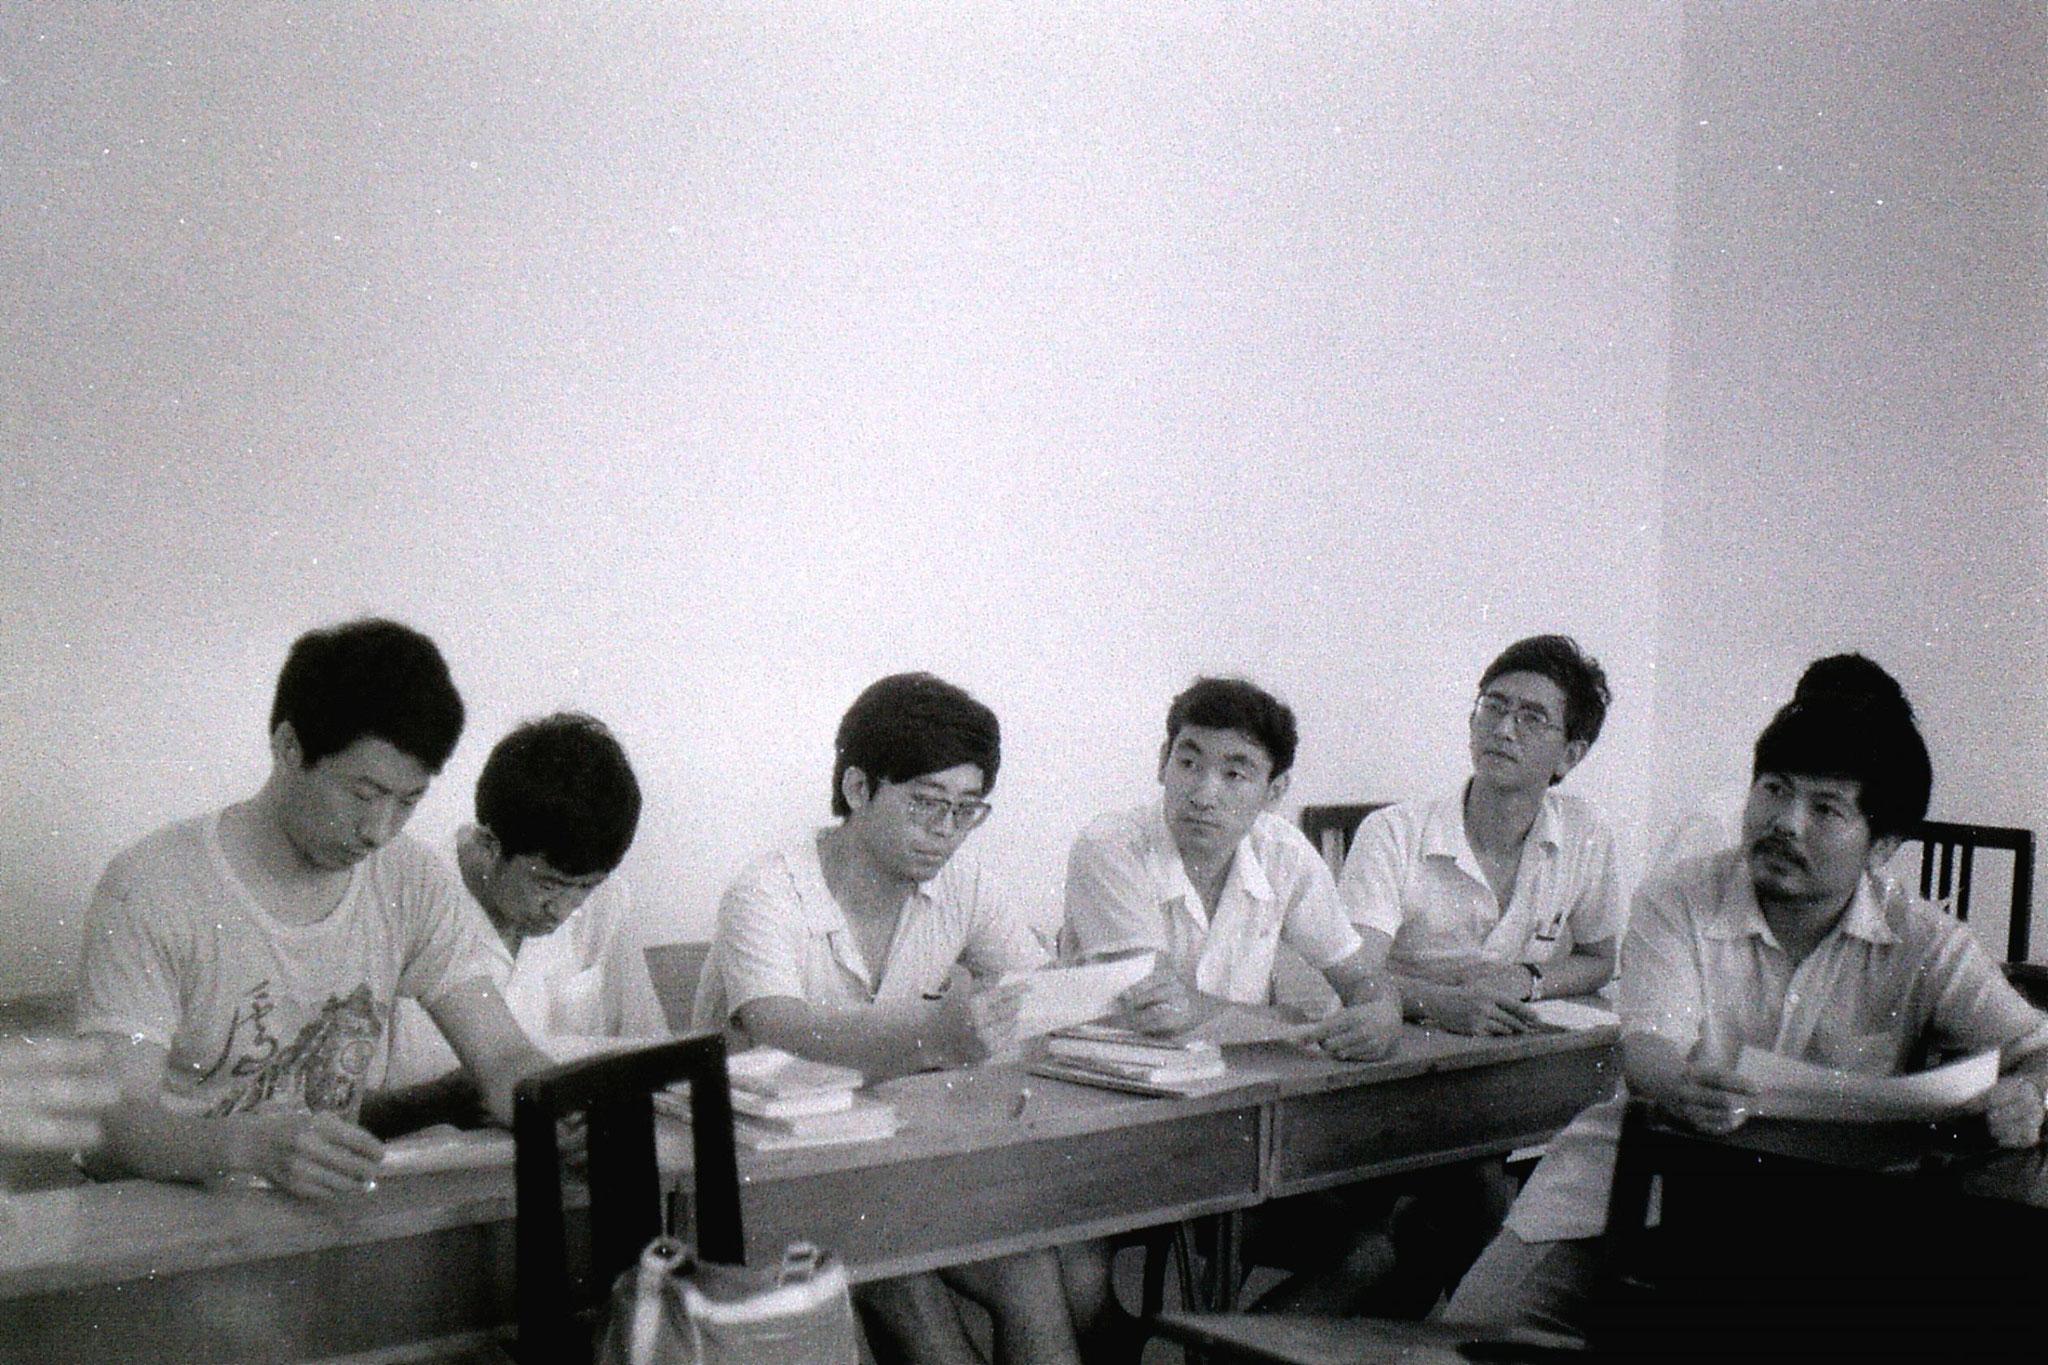 19/7/1989: 7: class